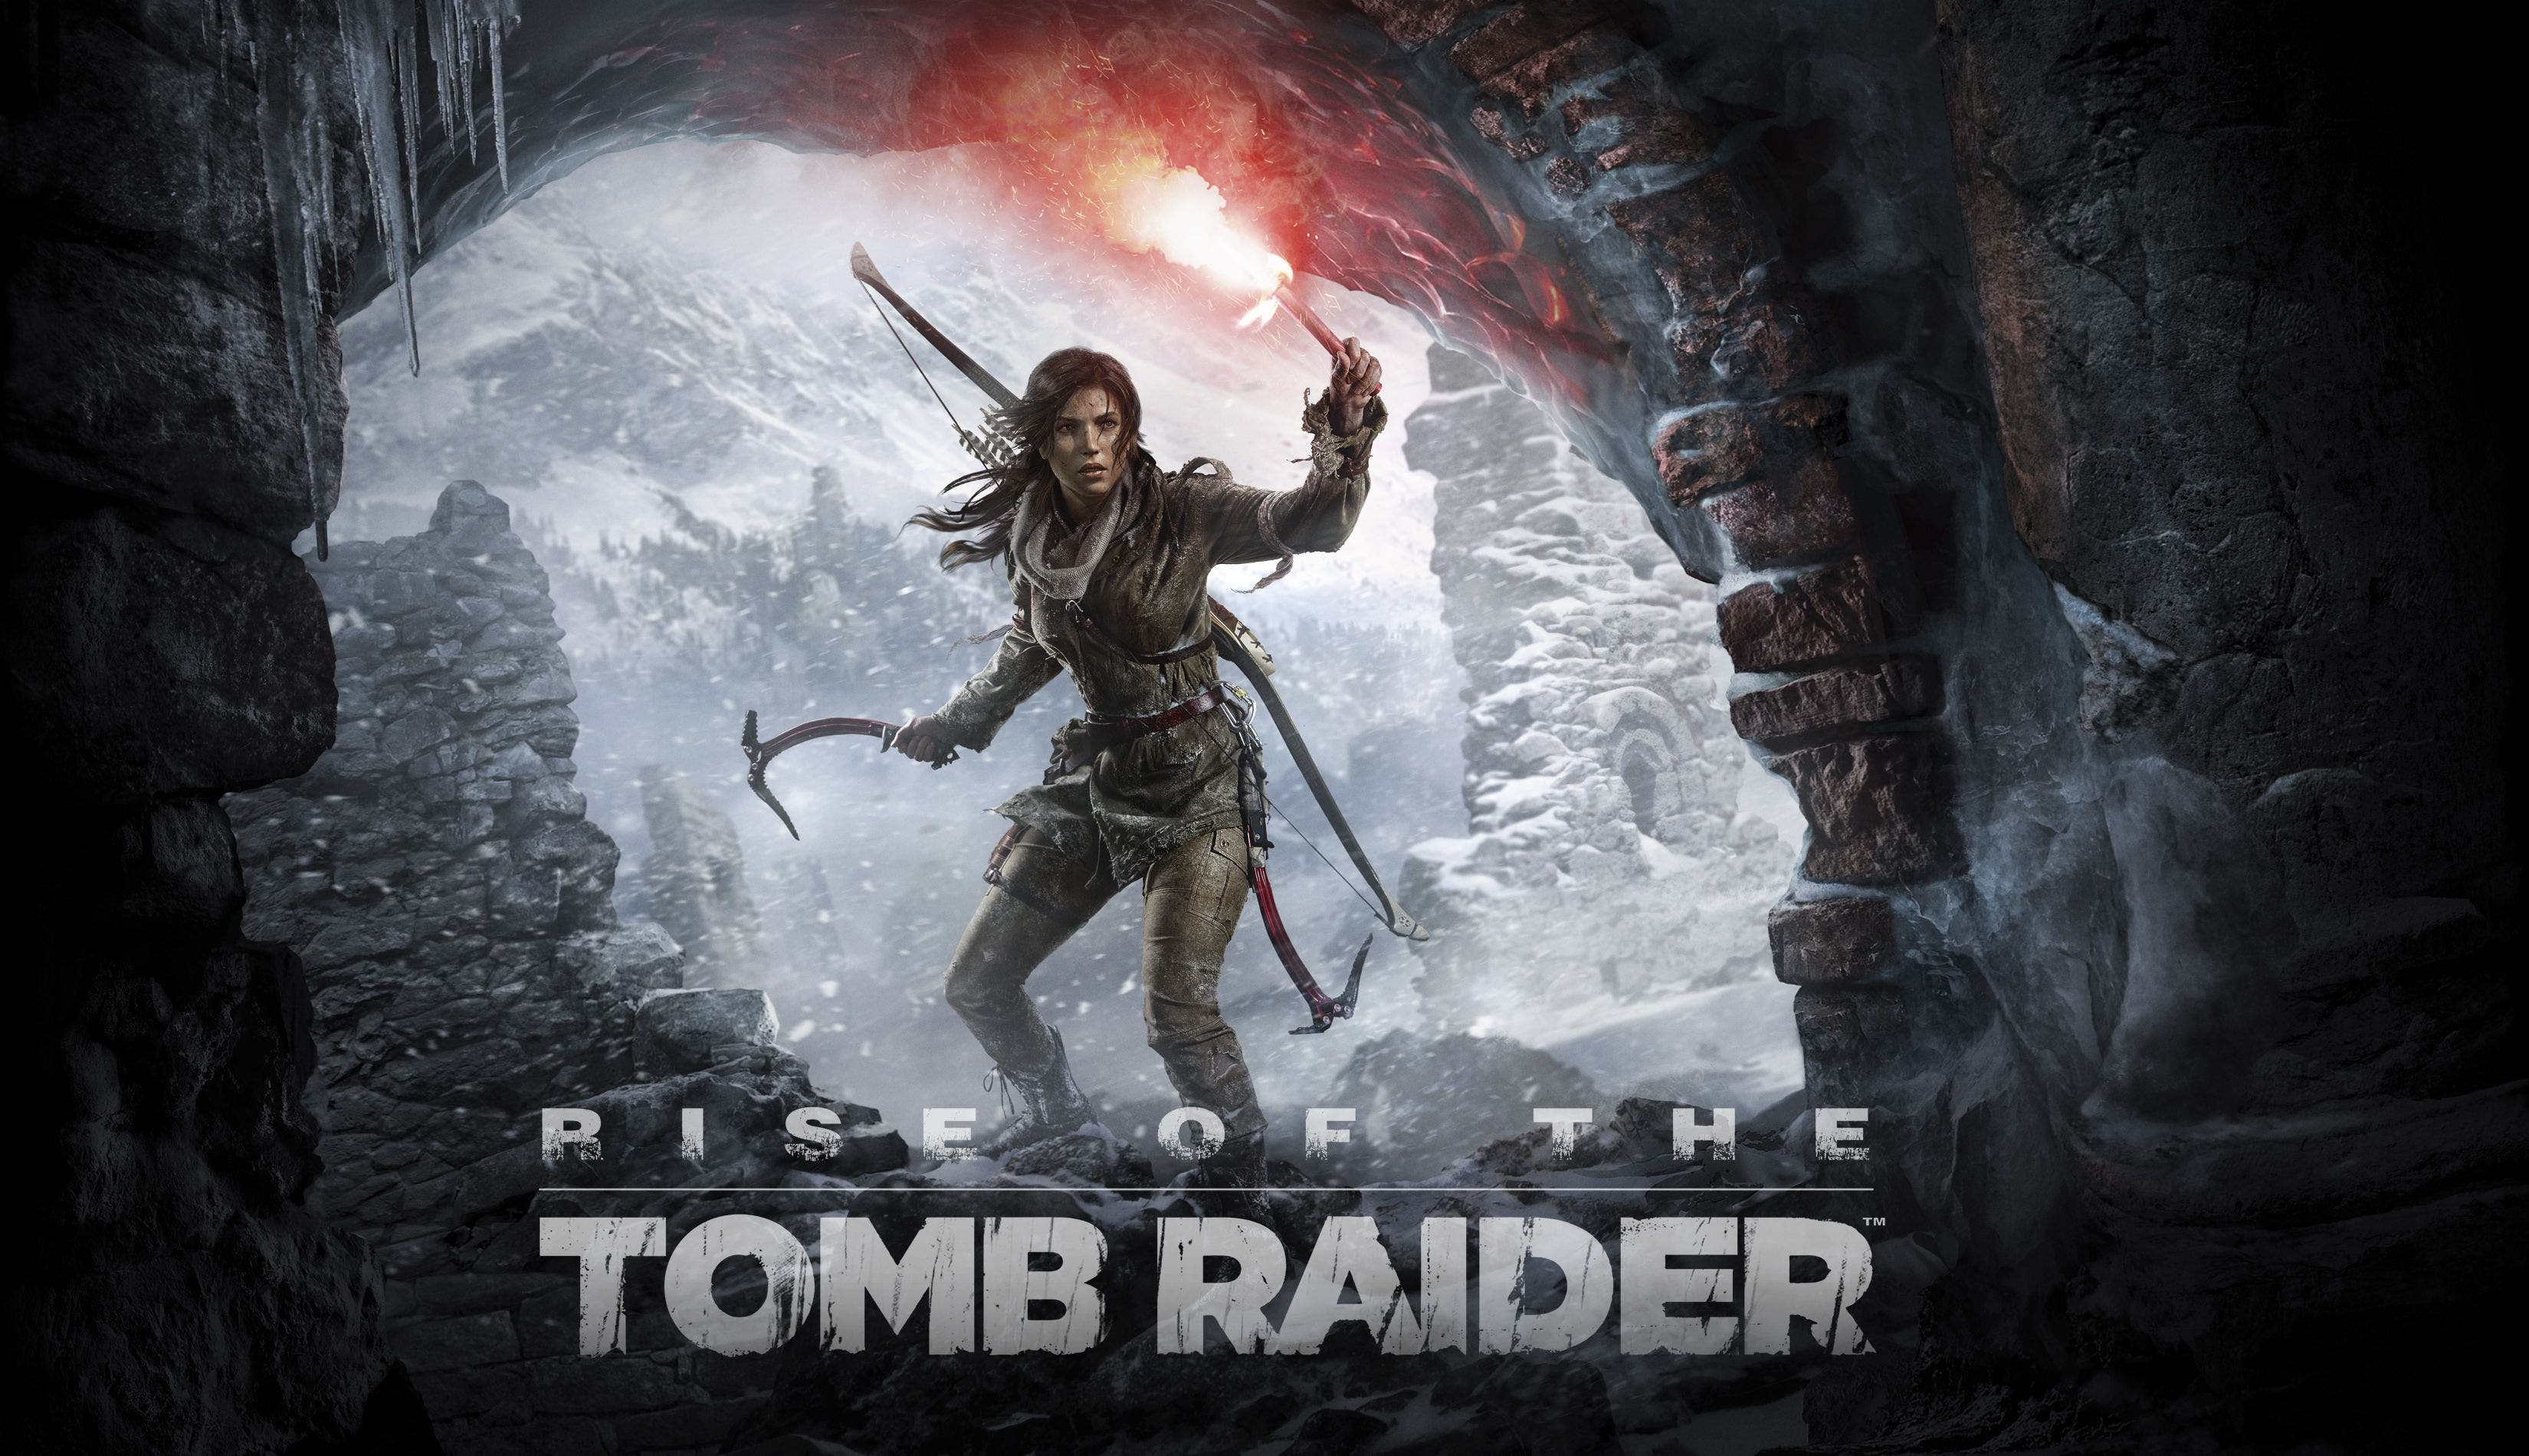 Rise of the tomb raider logo